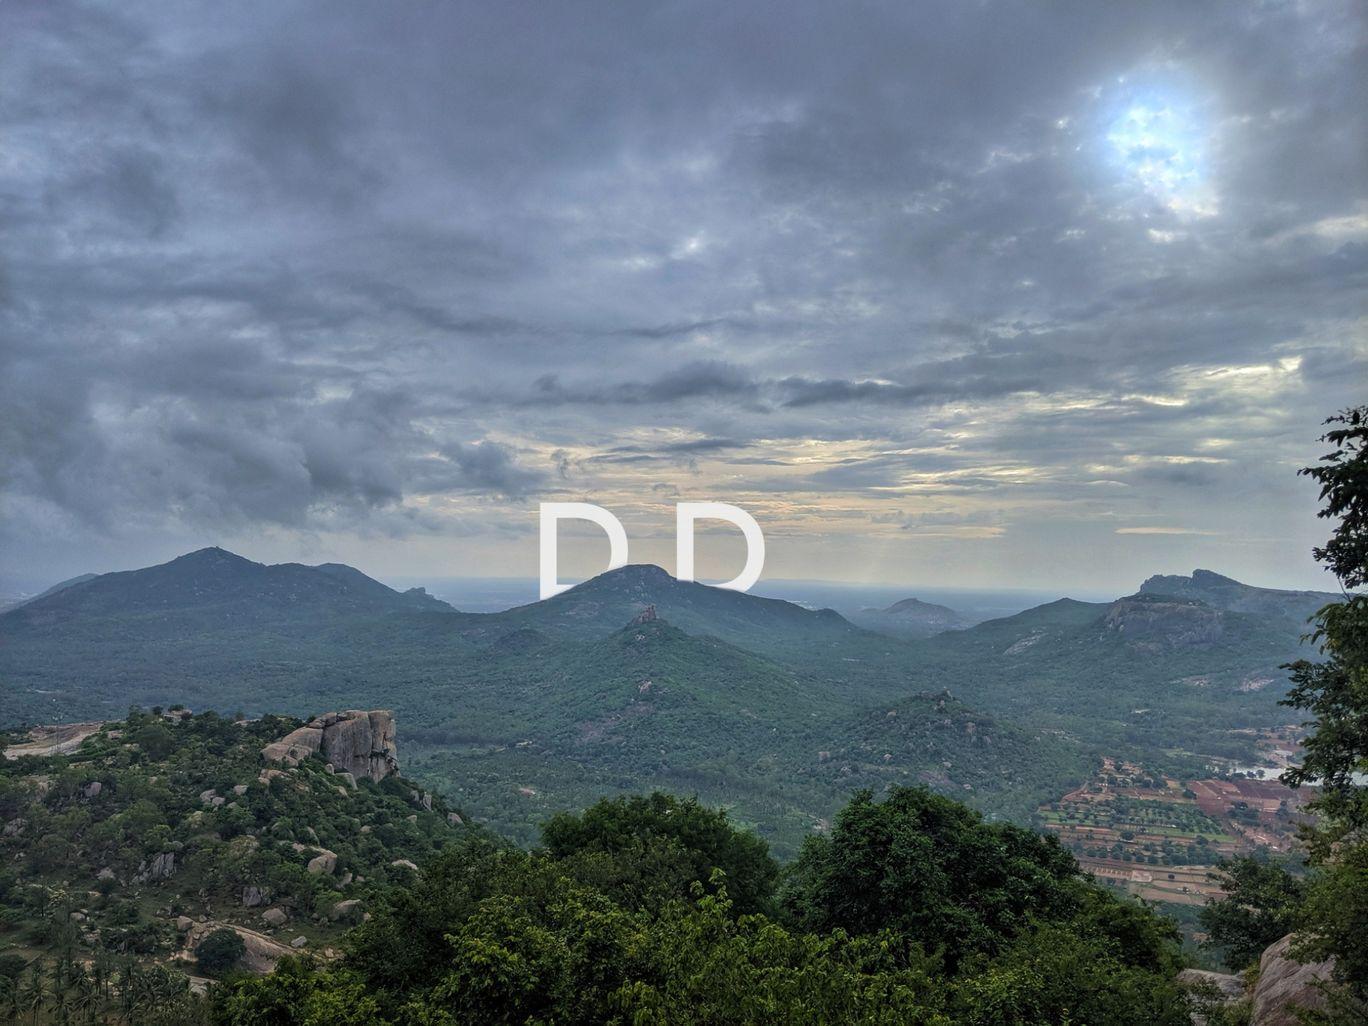 Photo of Devarayanadurga By Deepthi Gowda